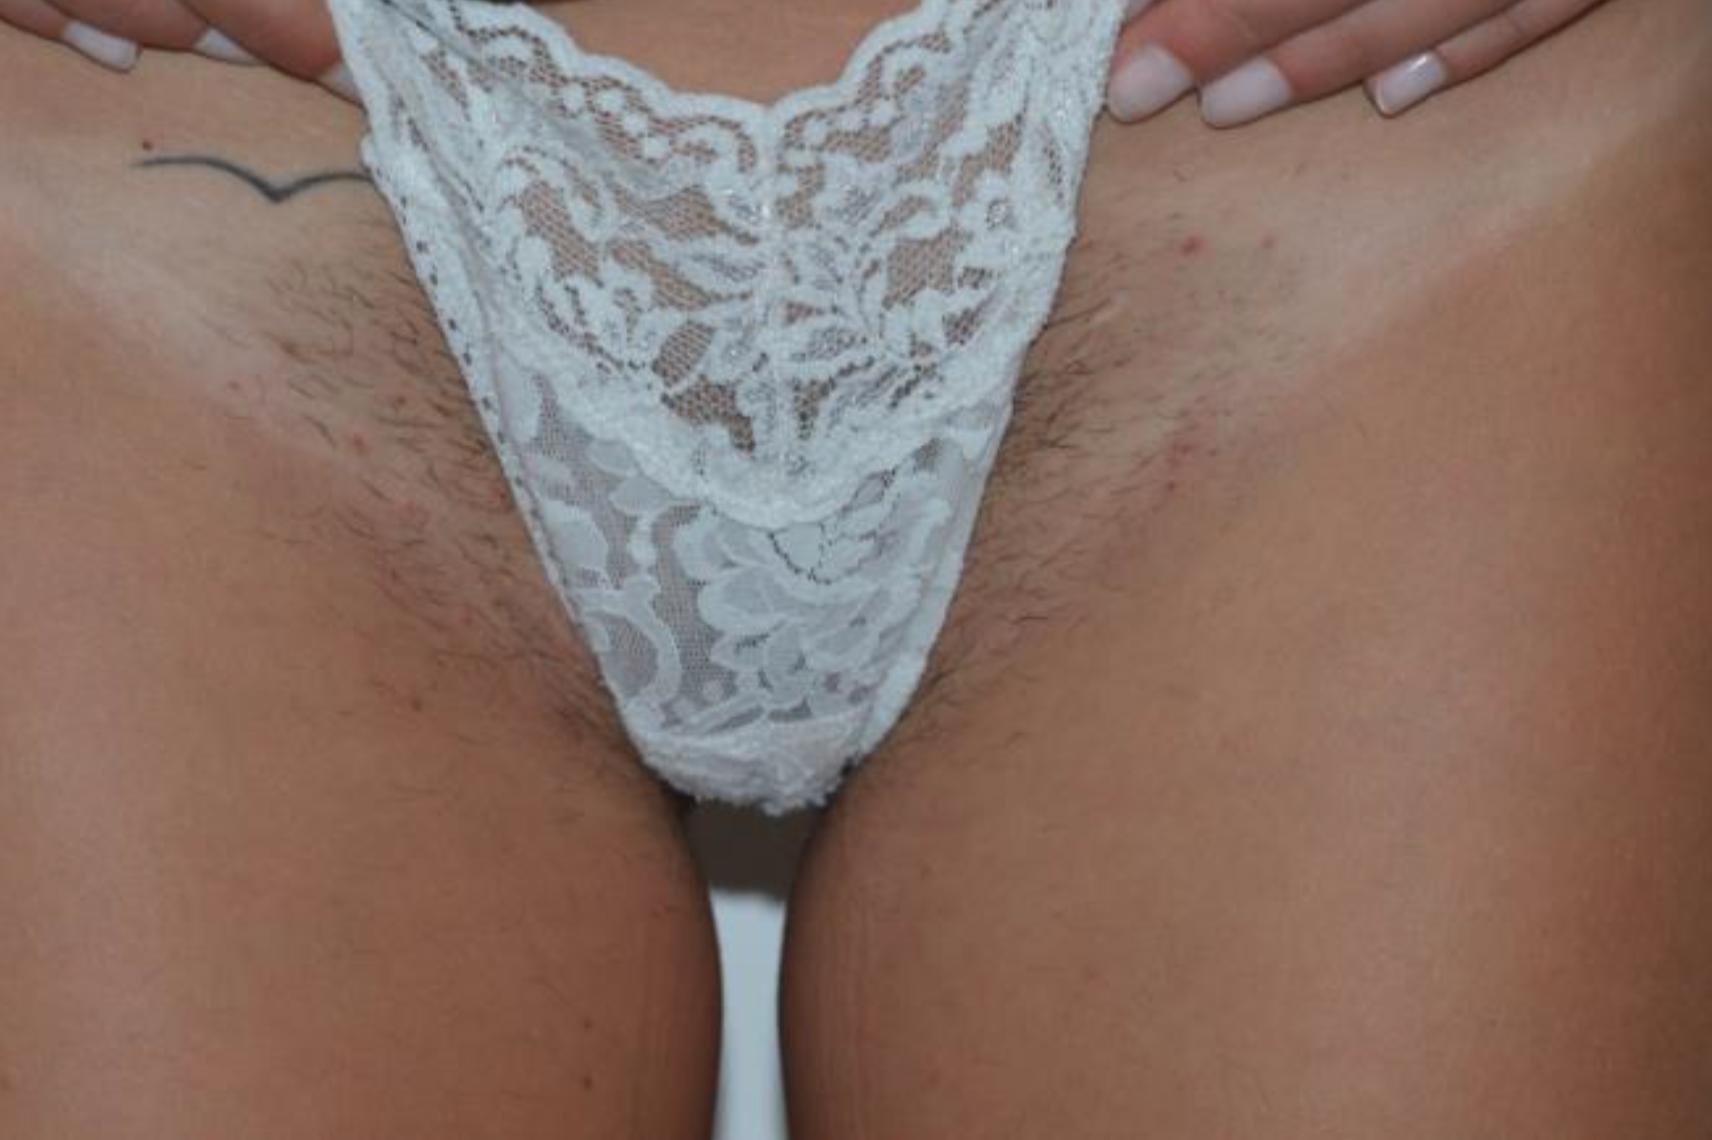 Motus X - Bikini 1 - Before